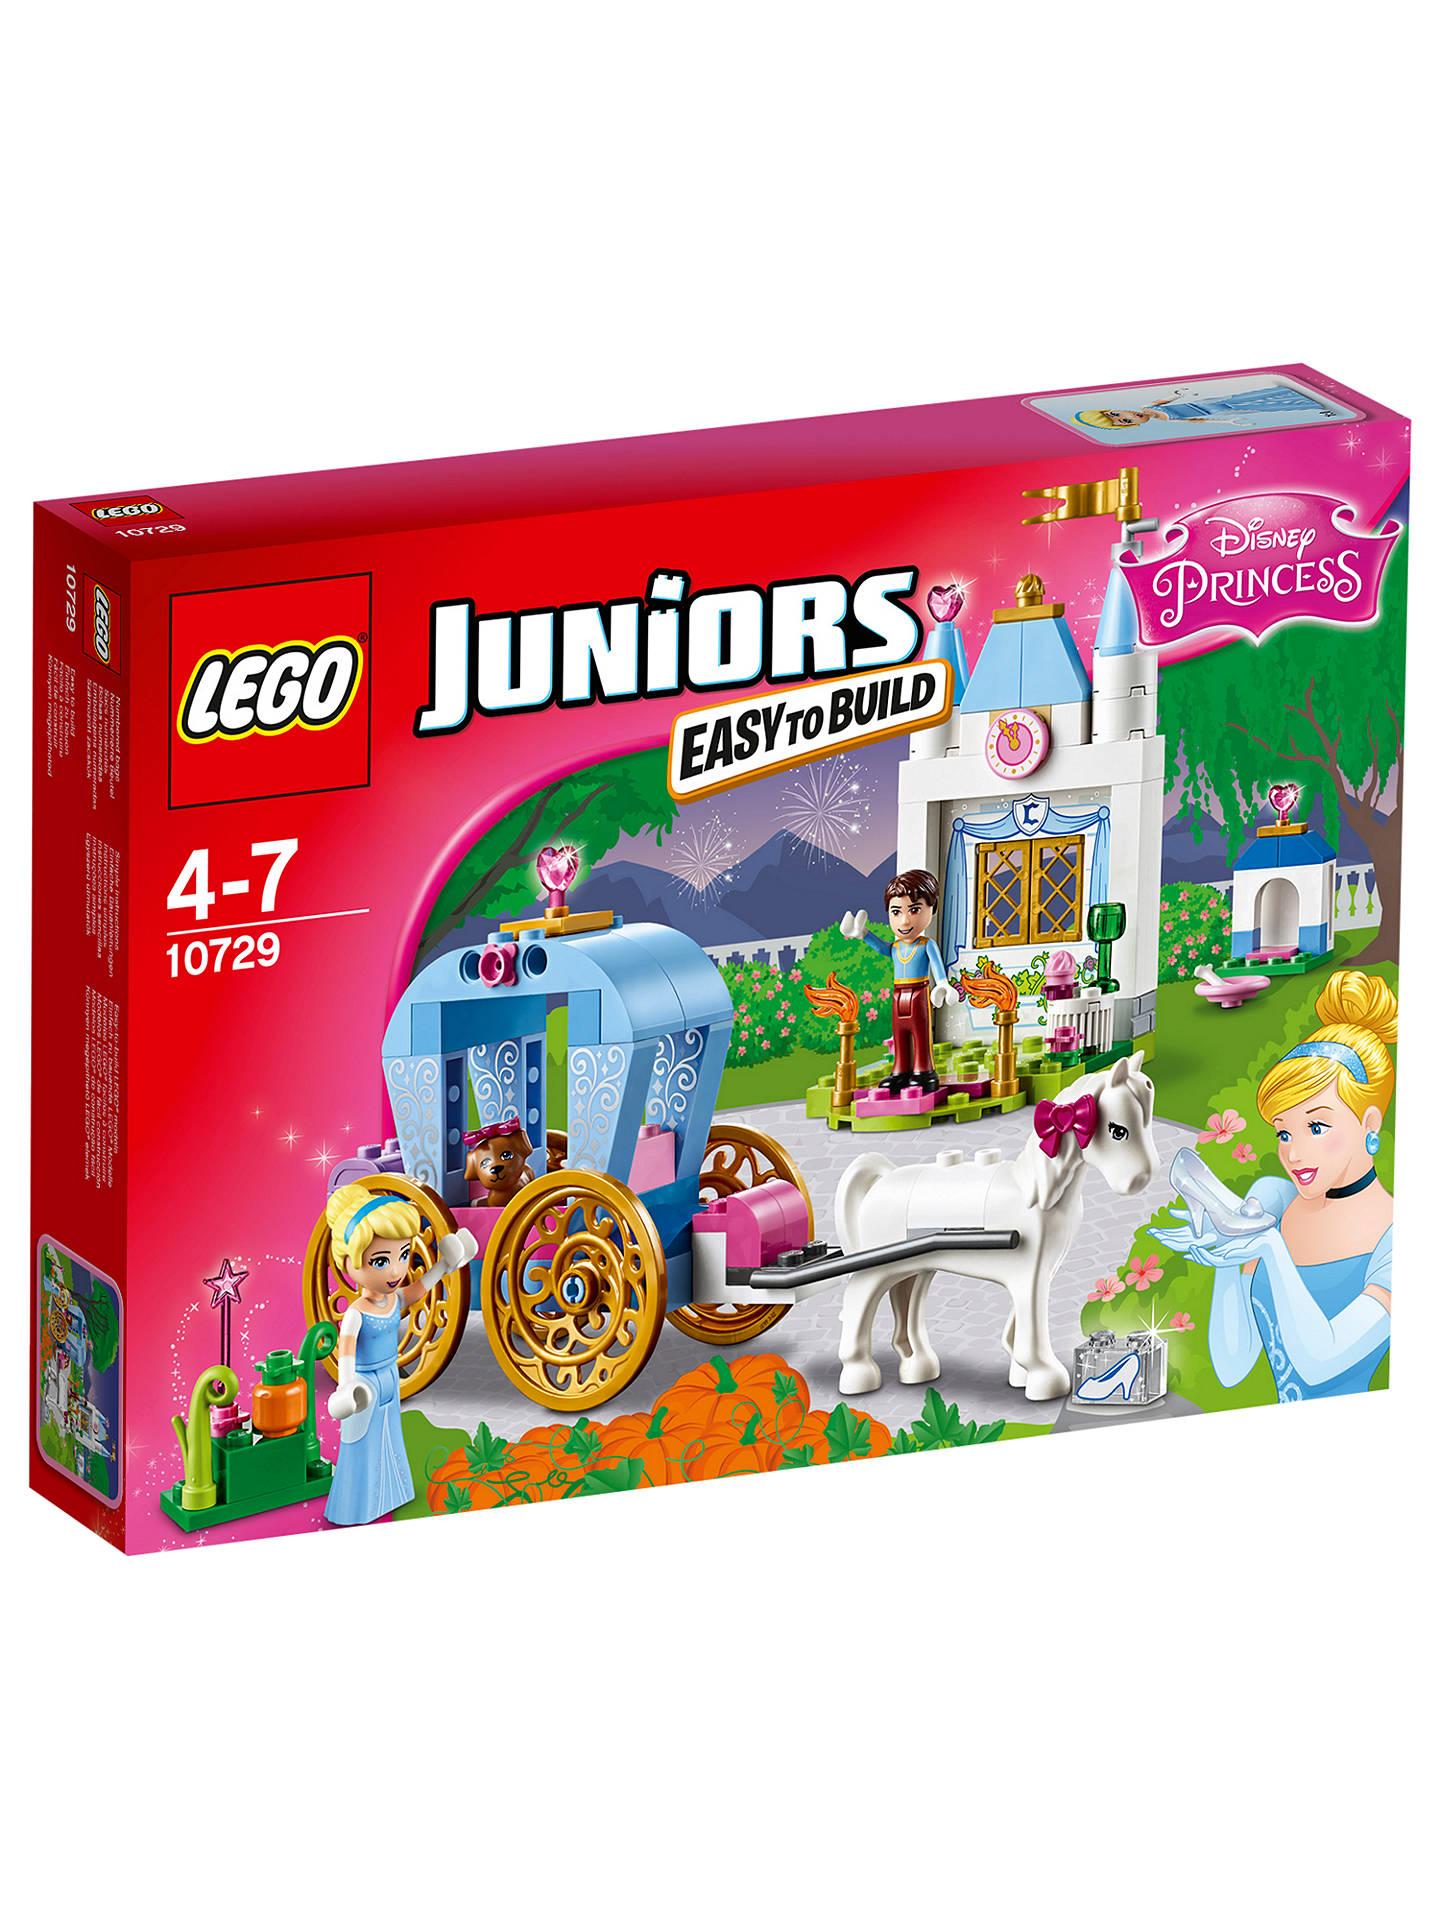 Lego Juniors 10729 Cinderella Carriage At John Lewis